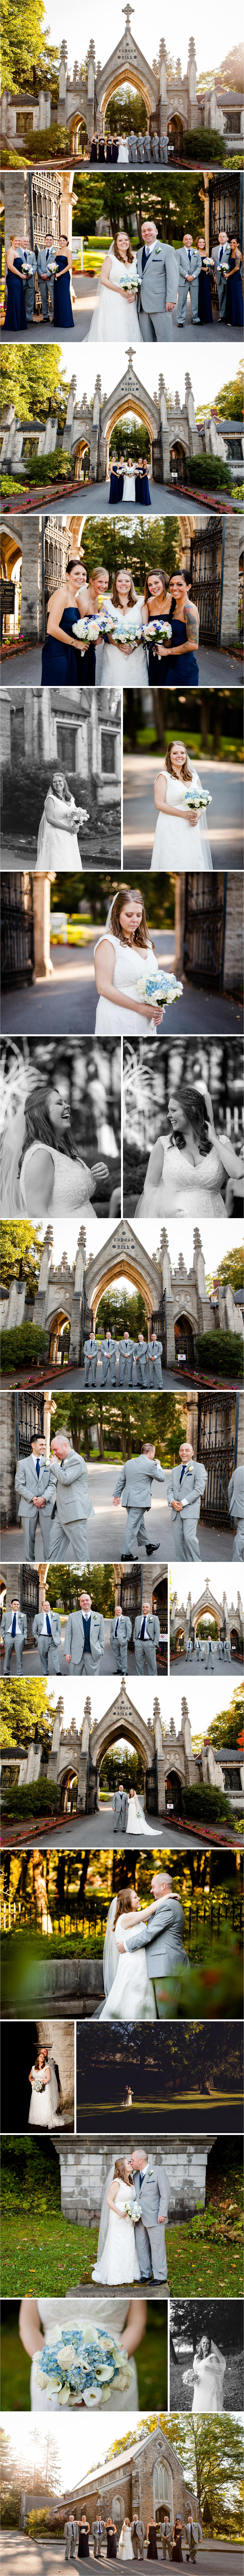 Utica_NY_Wedding_Portraits